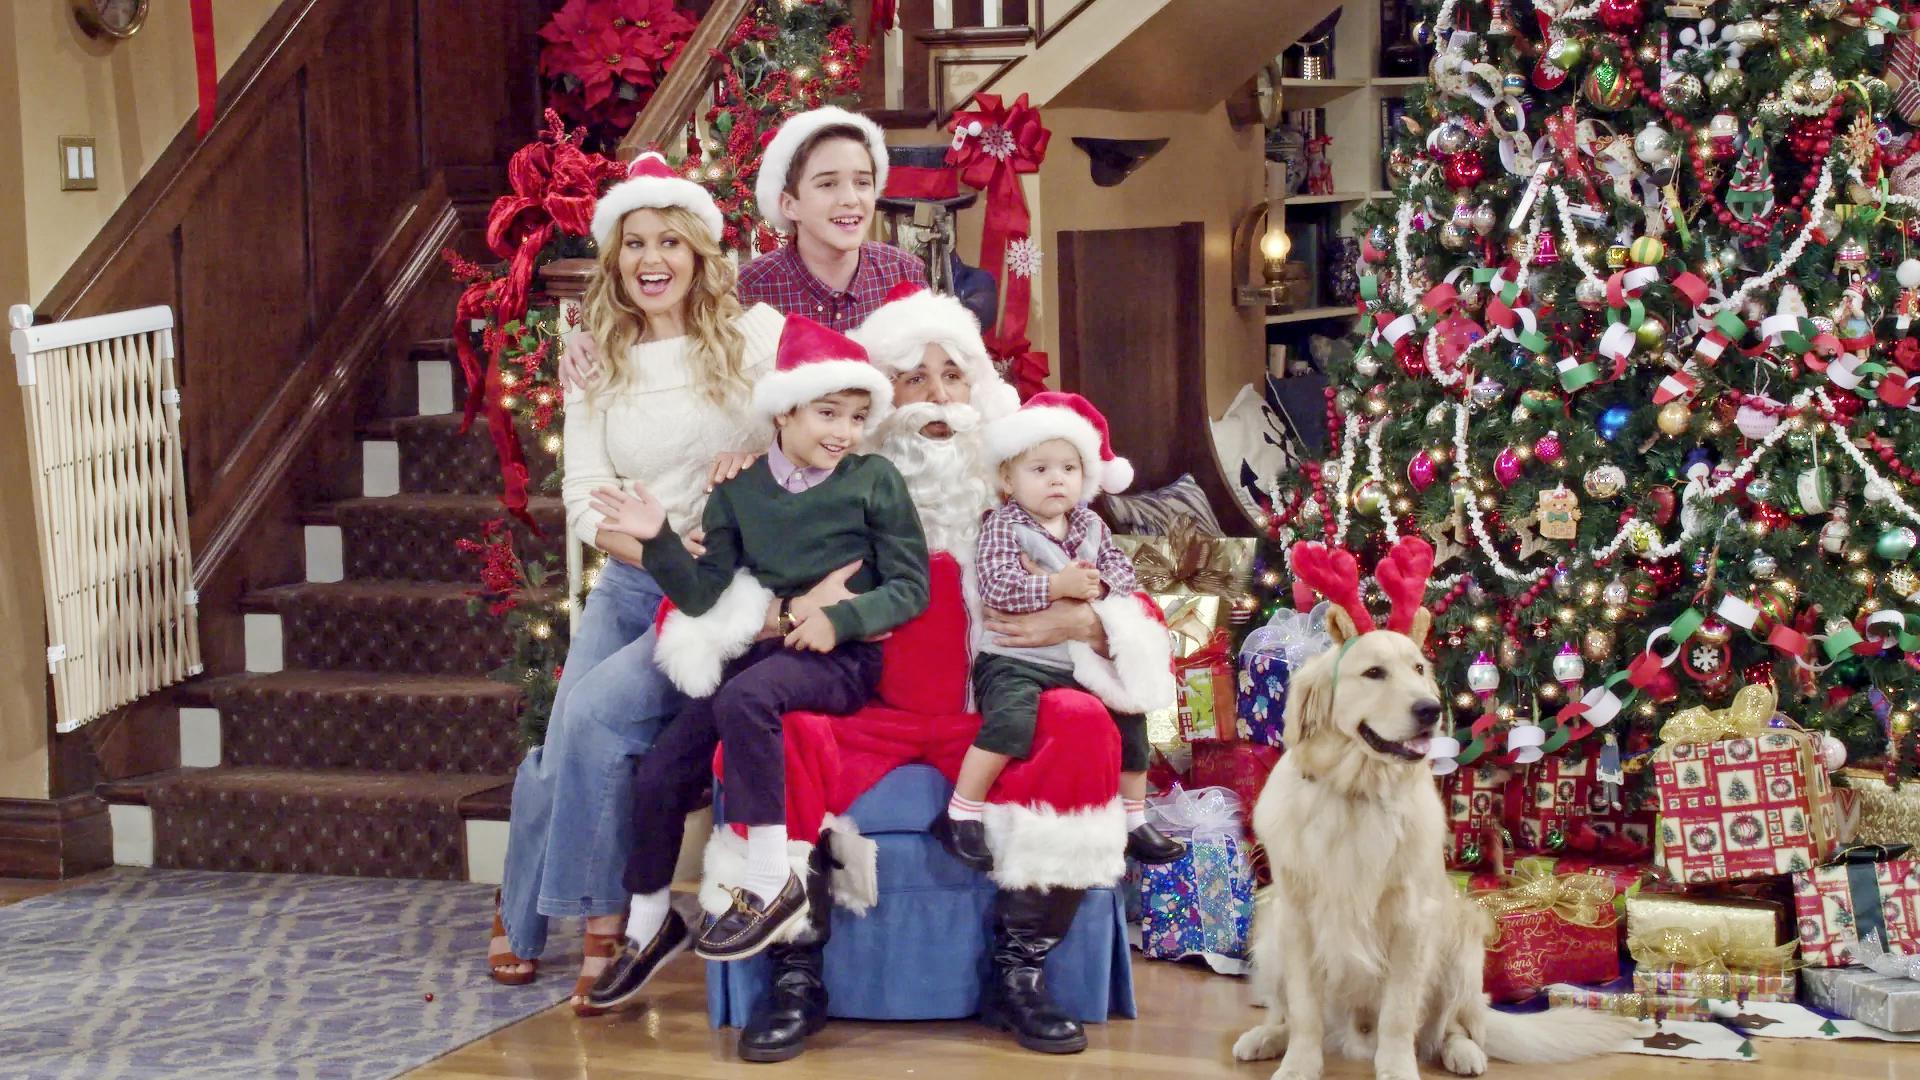 Full House Christmas Episodes.Fuller House S02e12 Nutcrackers Summary Season 2